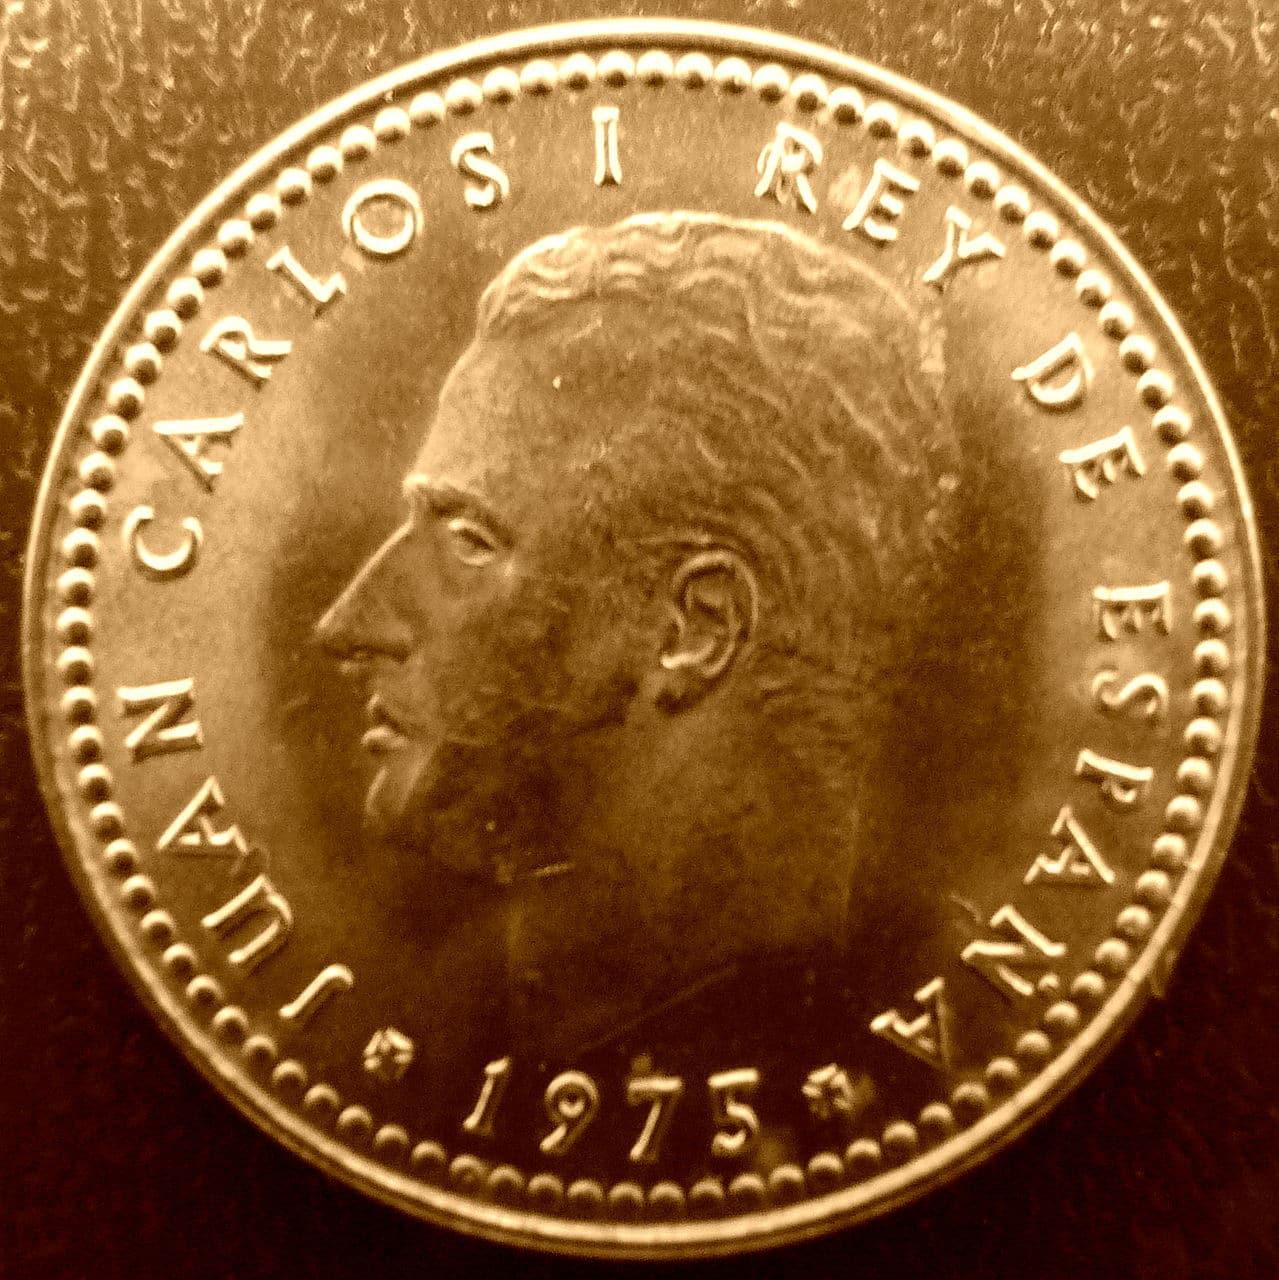 Una peseta 1975 *78. Gran Bretaña - Dedicada a flekyangel Peseta75_78_a